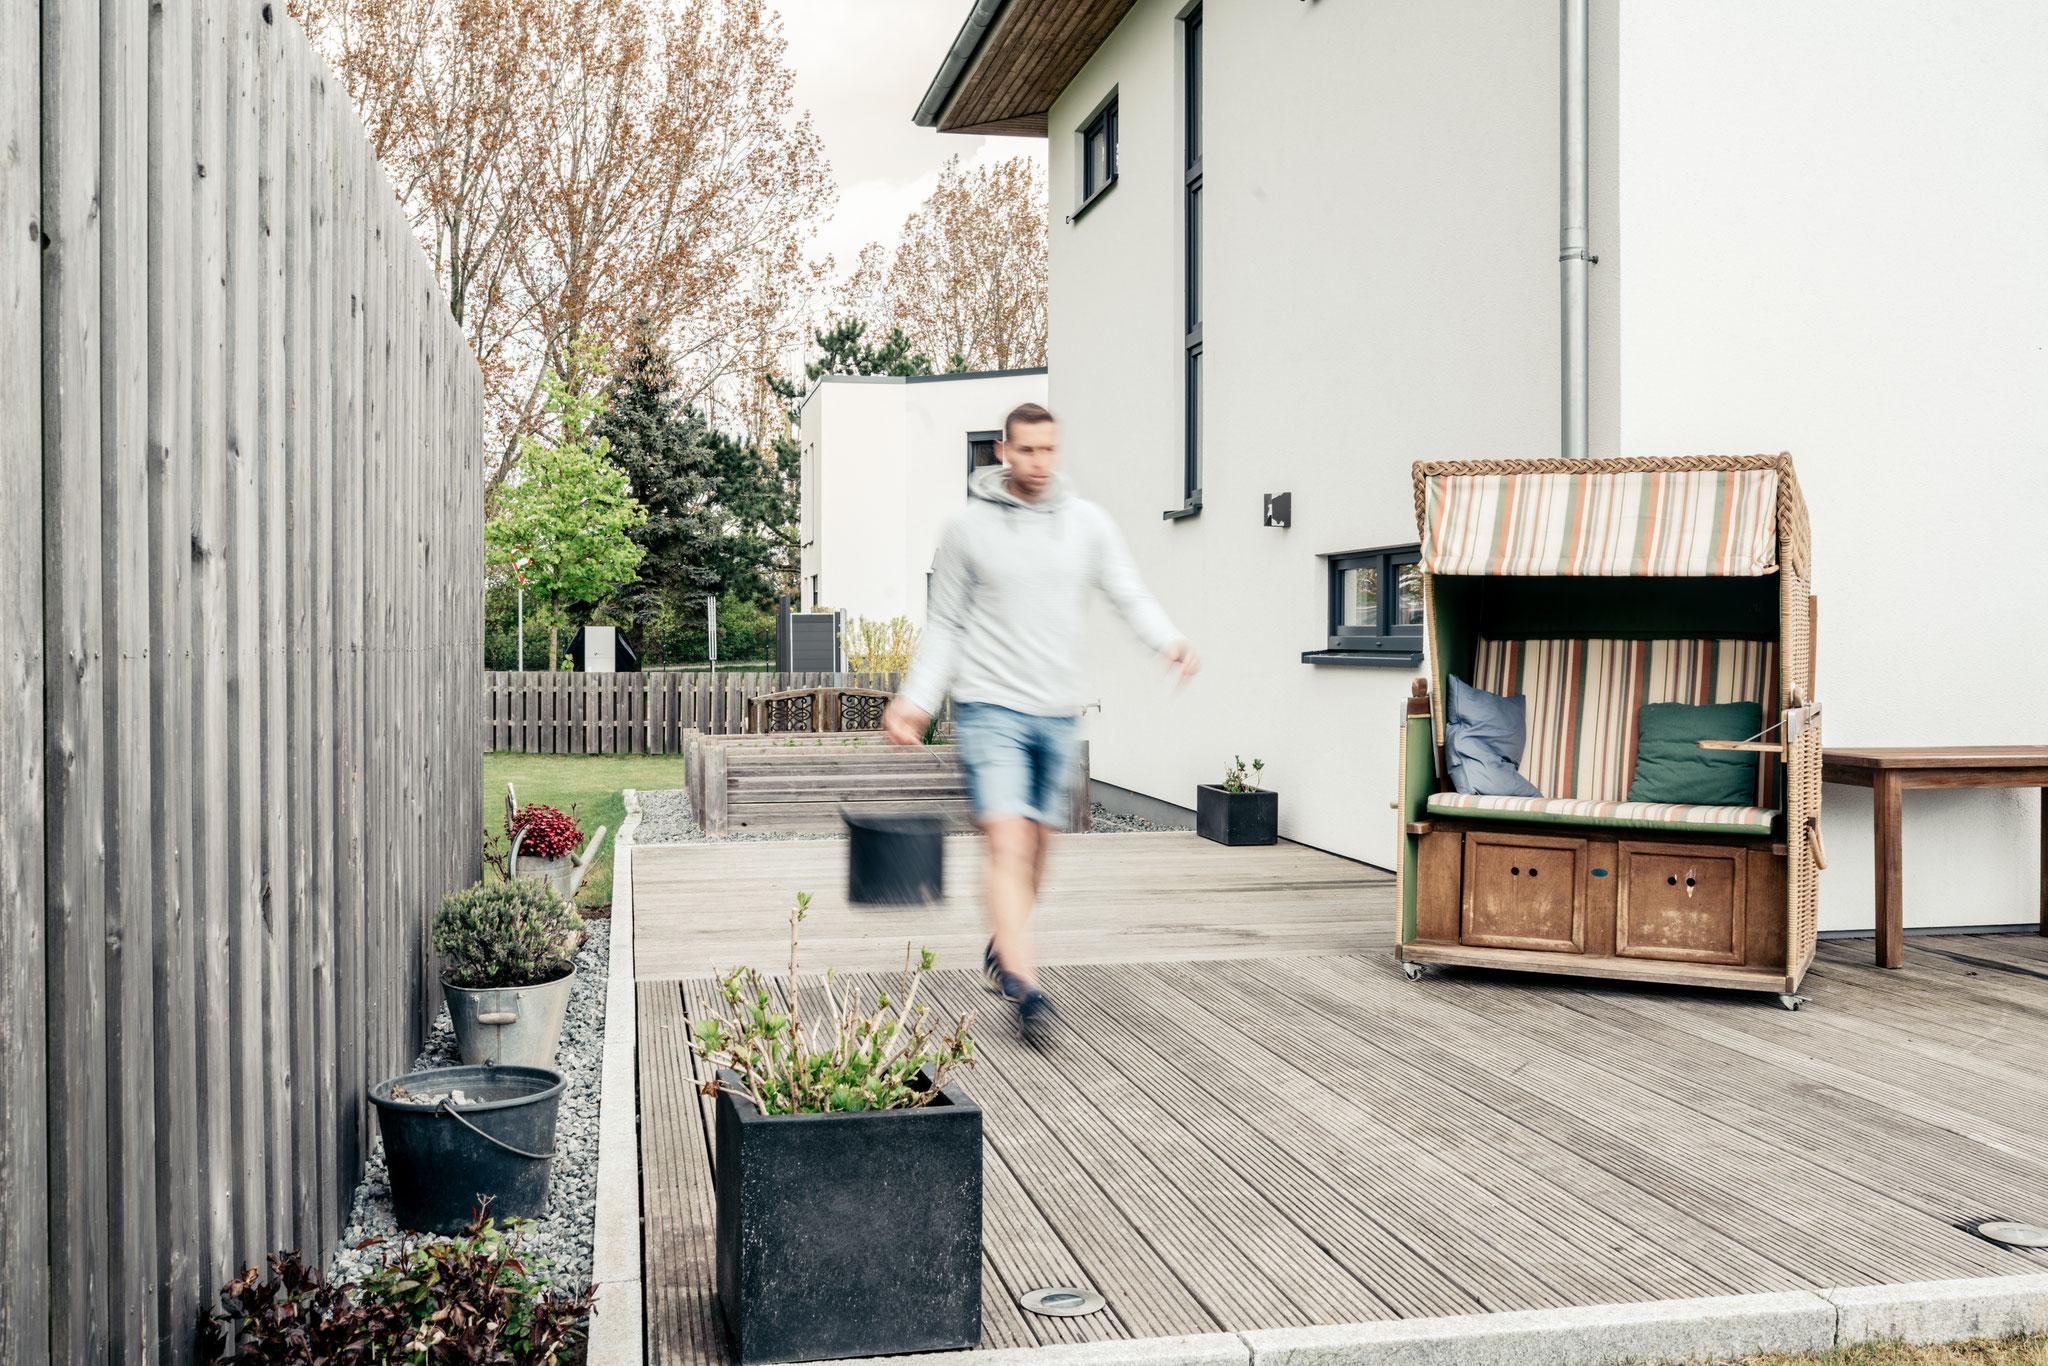 Terrasse und Zaun Elmenhorst